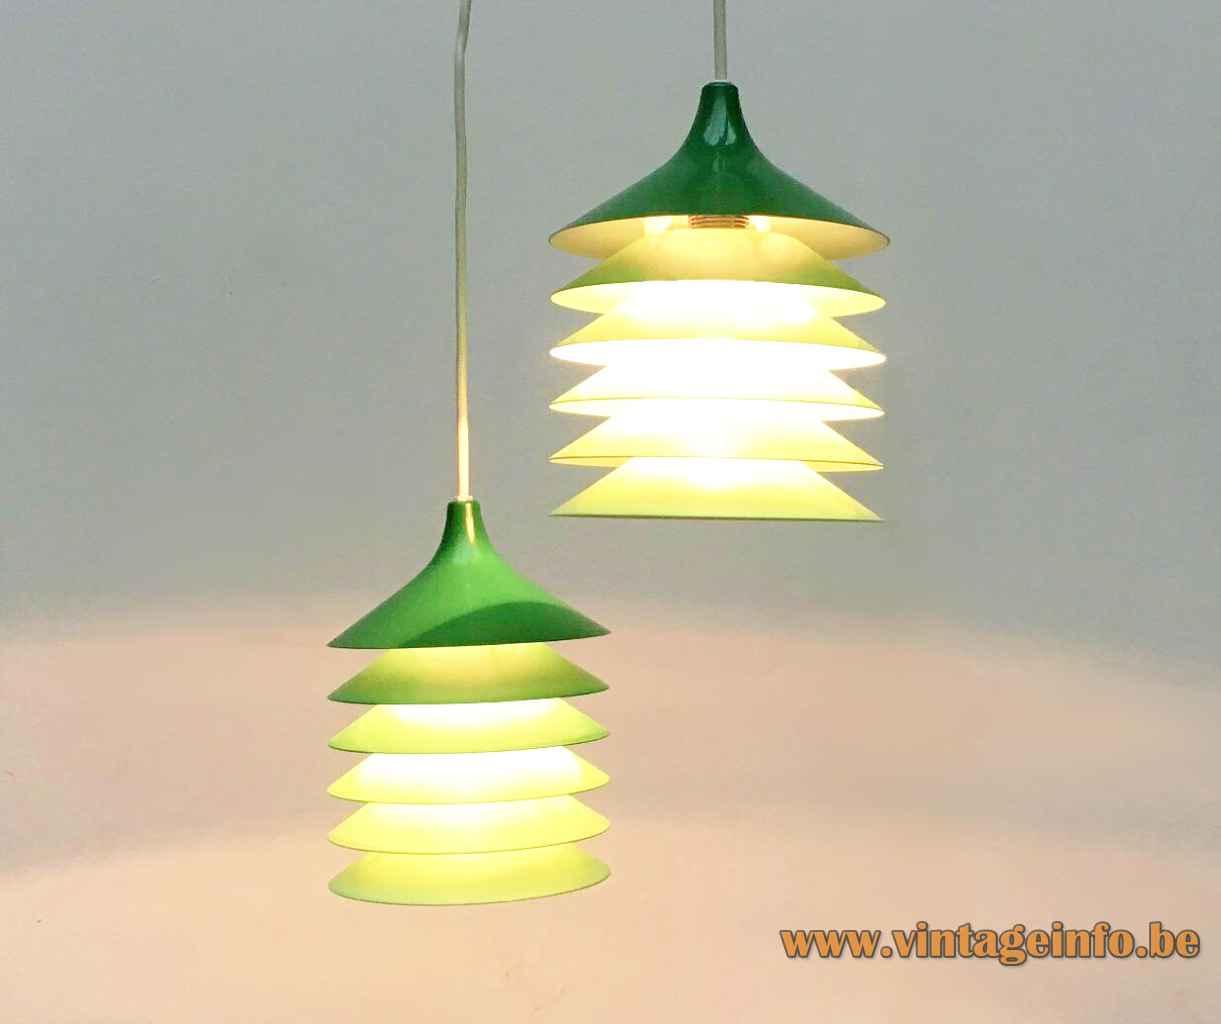 IKEA Duett pendant lamp green layerd aluminium discs lampshades 1983 design: Bent Gantzel Boysen E14 socket